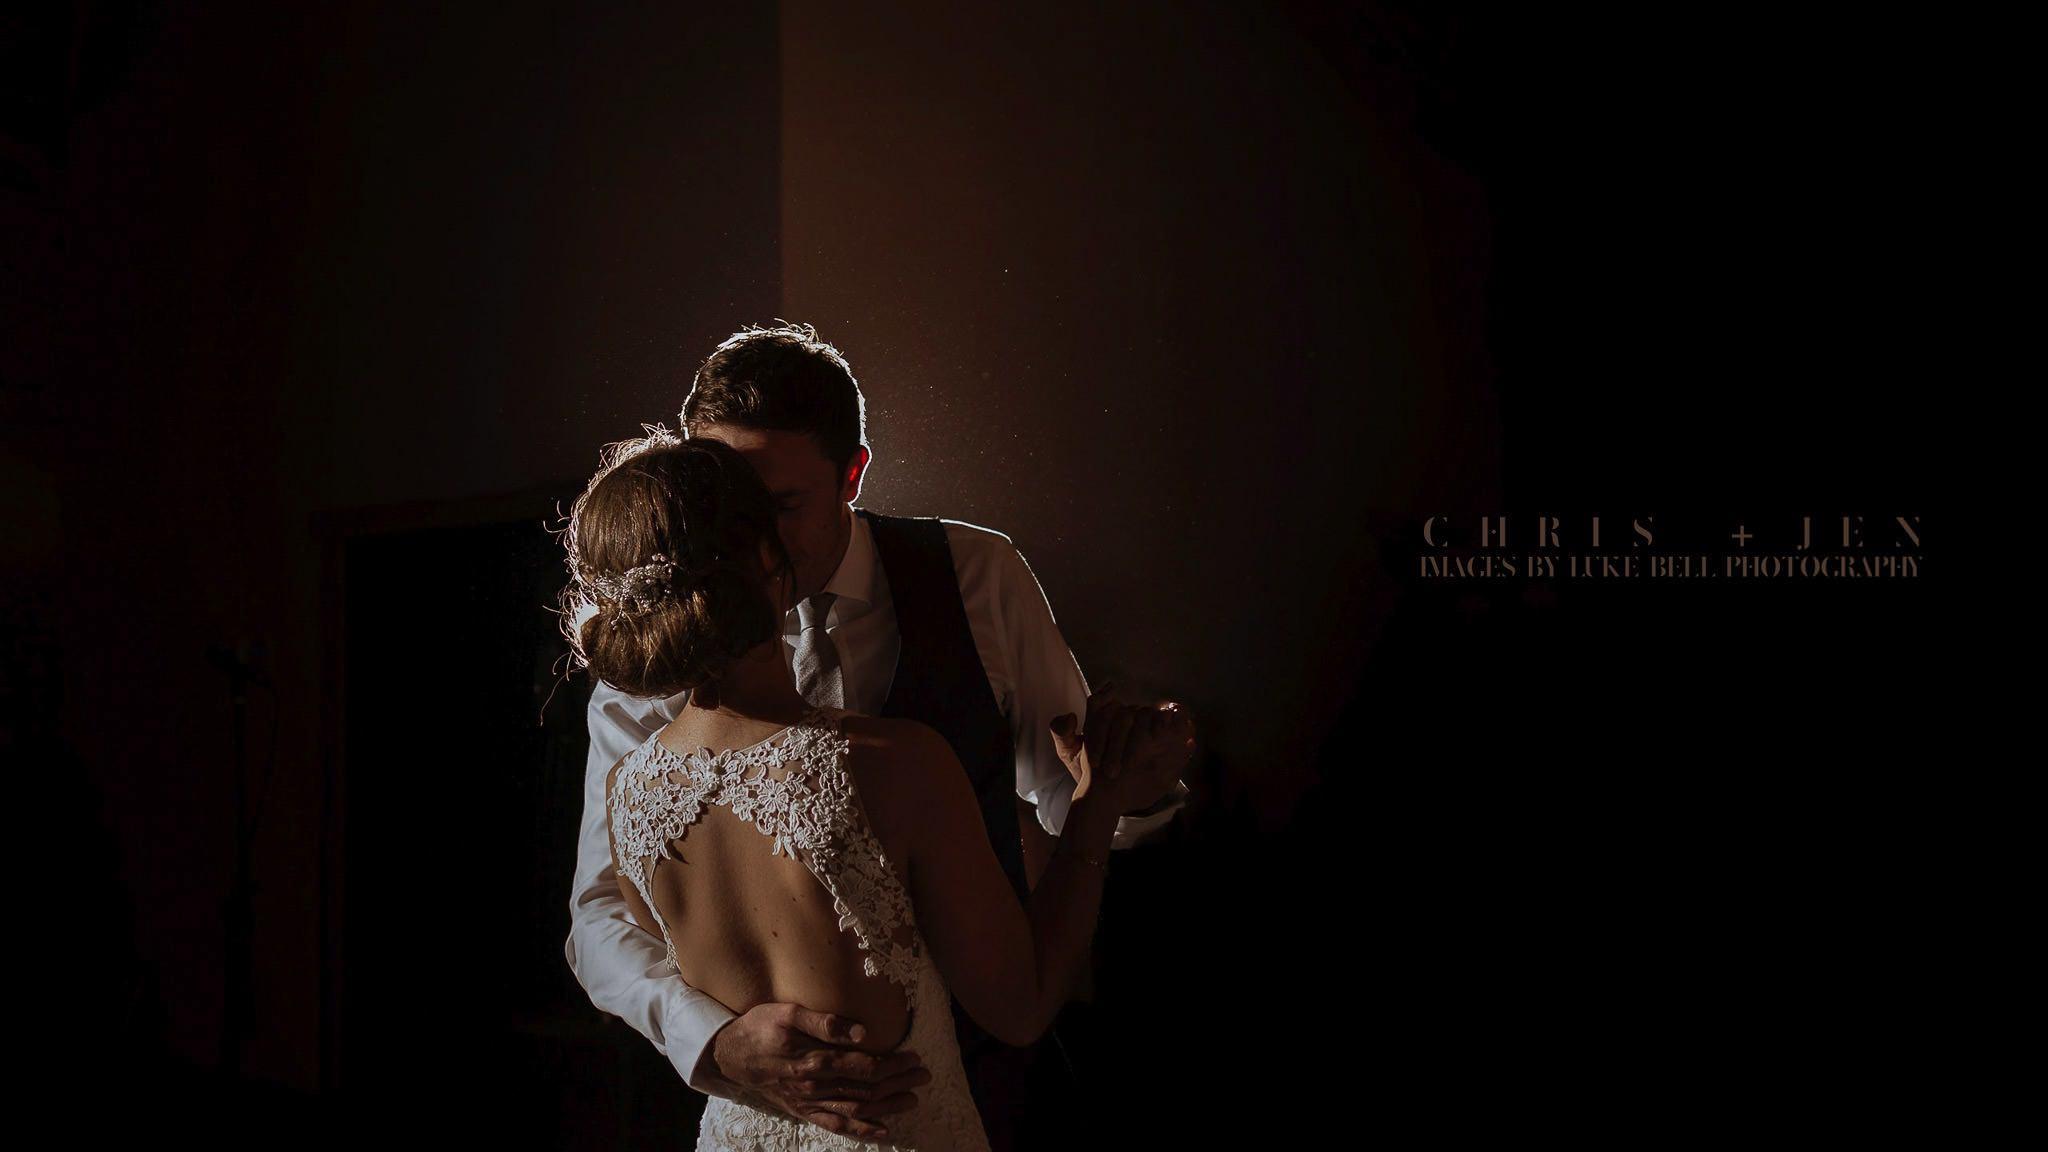 Hornington Manor Wedding Photography   Chris + Jen